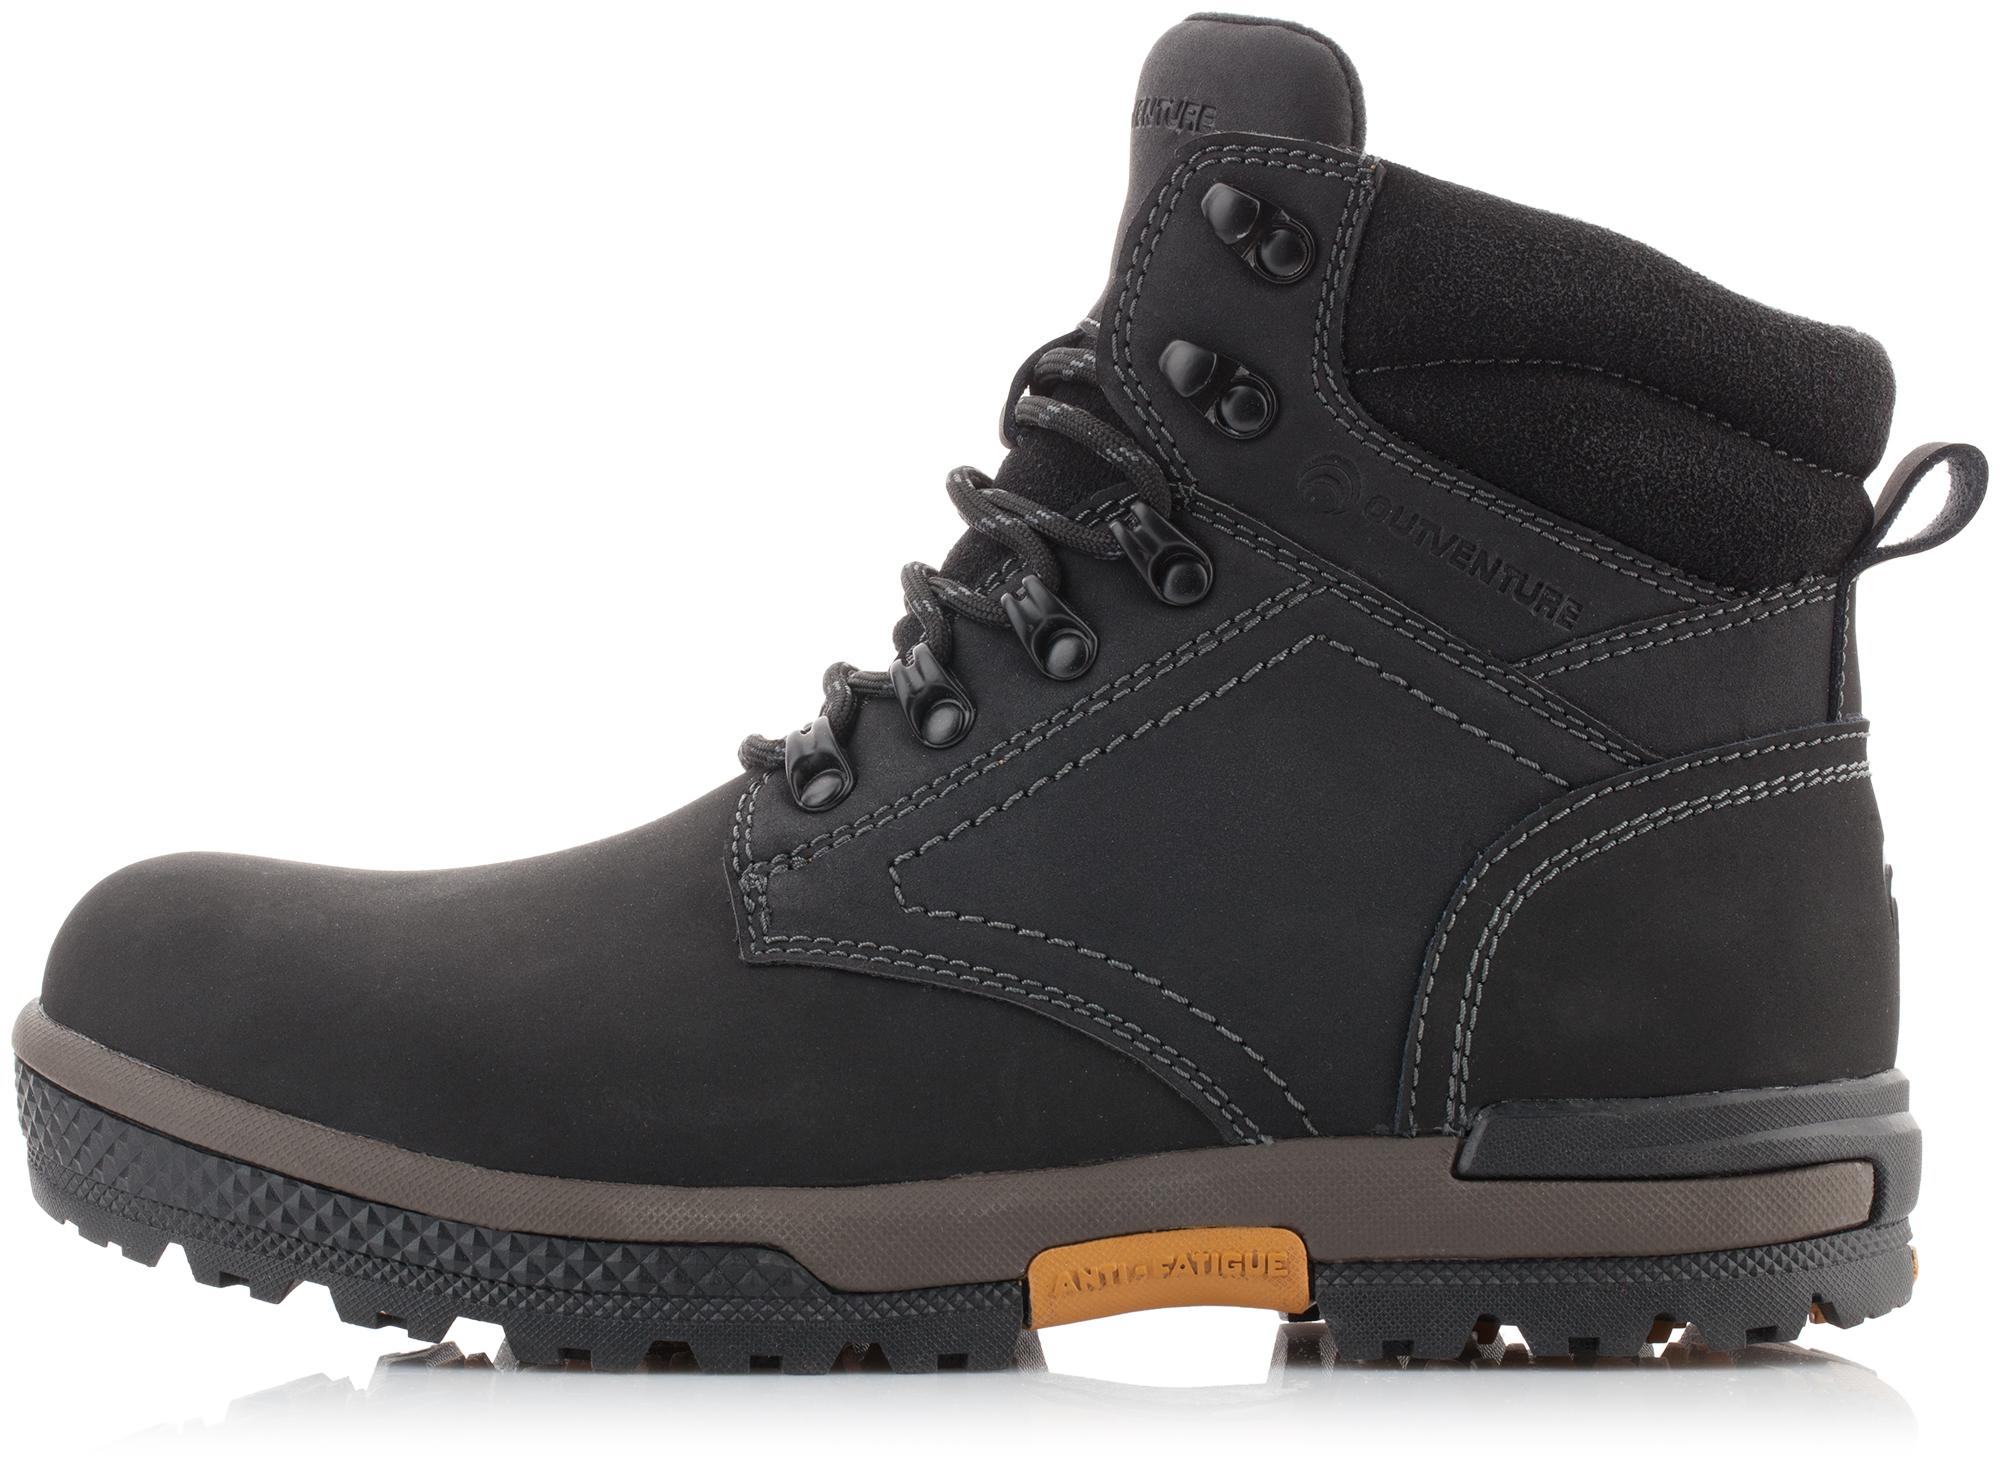 Outventure Ботинки утепленные мужские Outventure Winkler I купить мужские ботинки осенние в интернет магазине